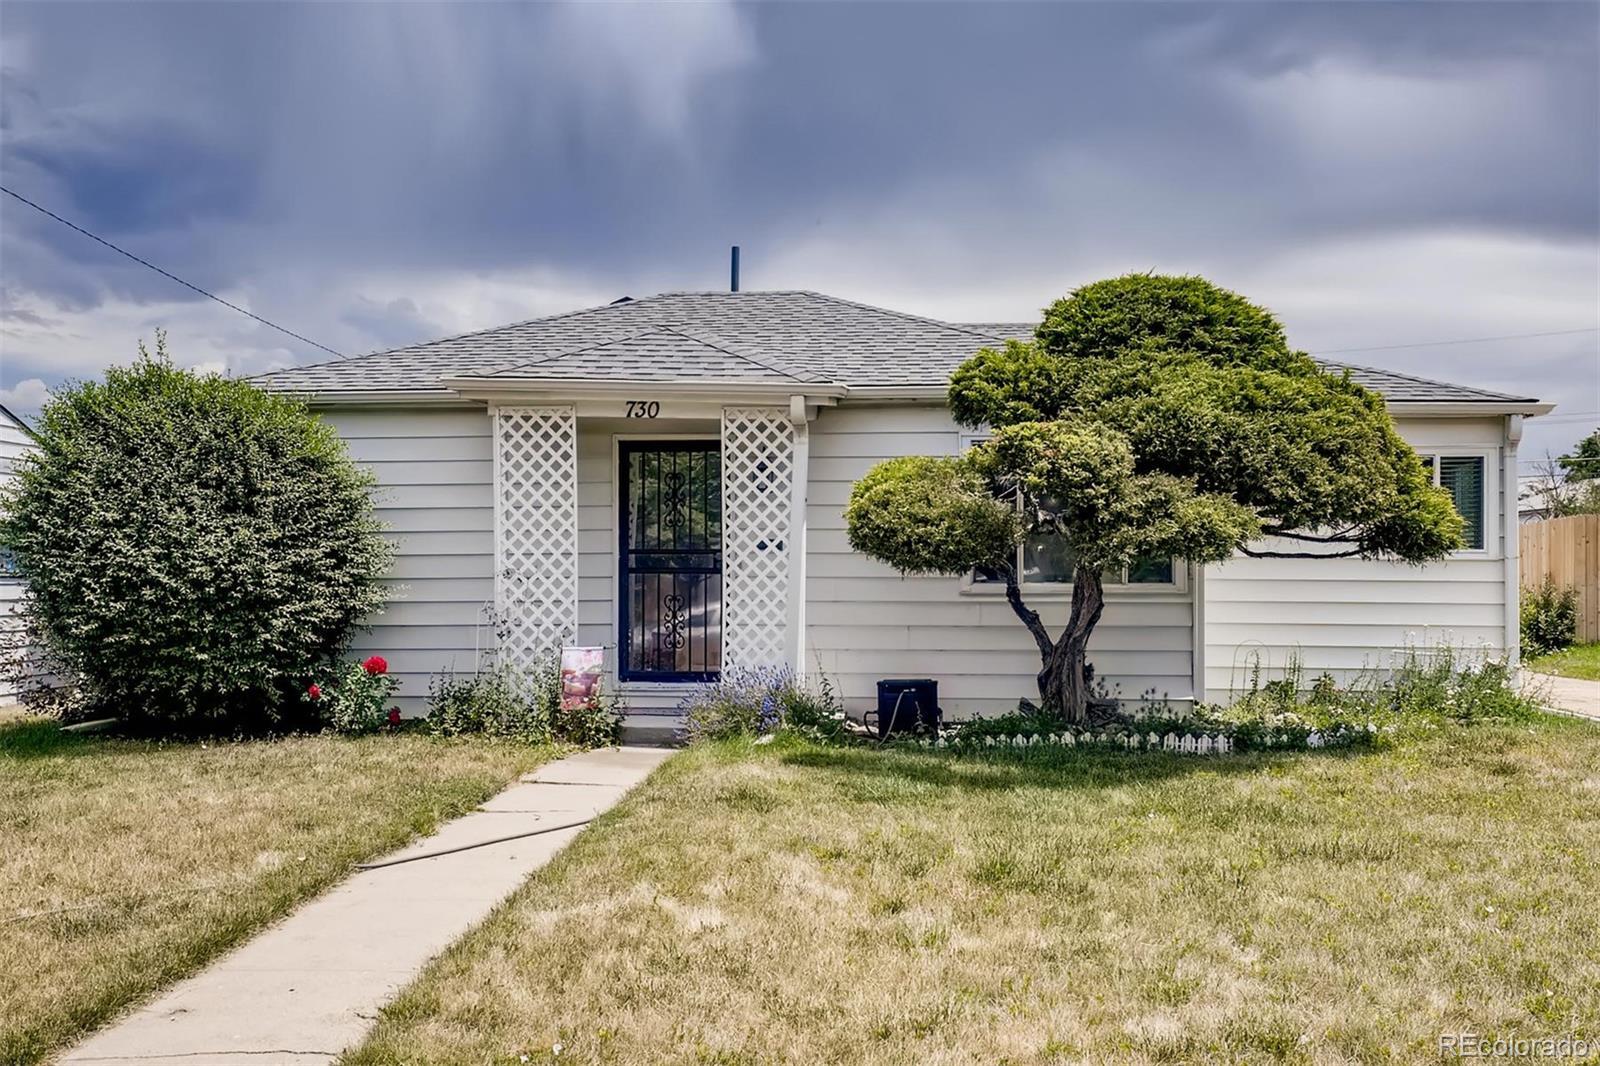 730 S Tejon Street Property Photo - Denver, CO real estate listing